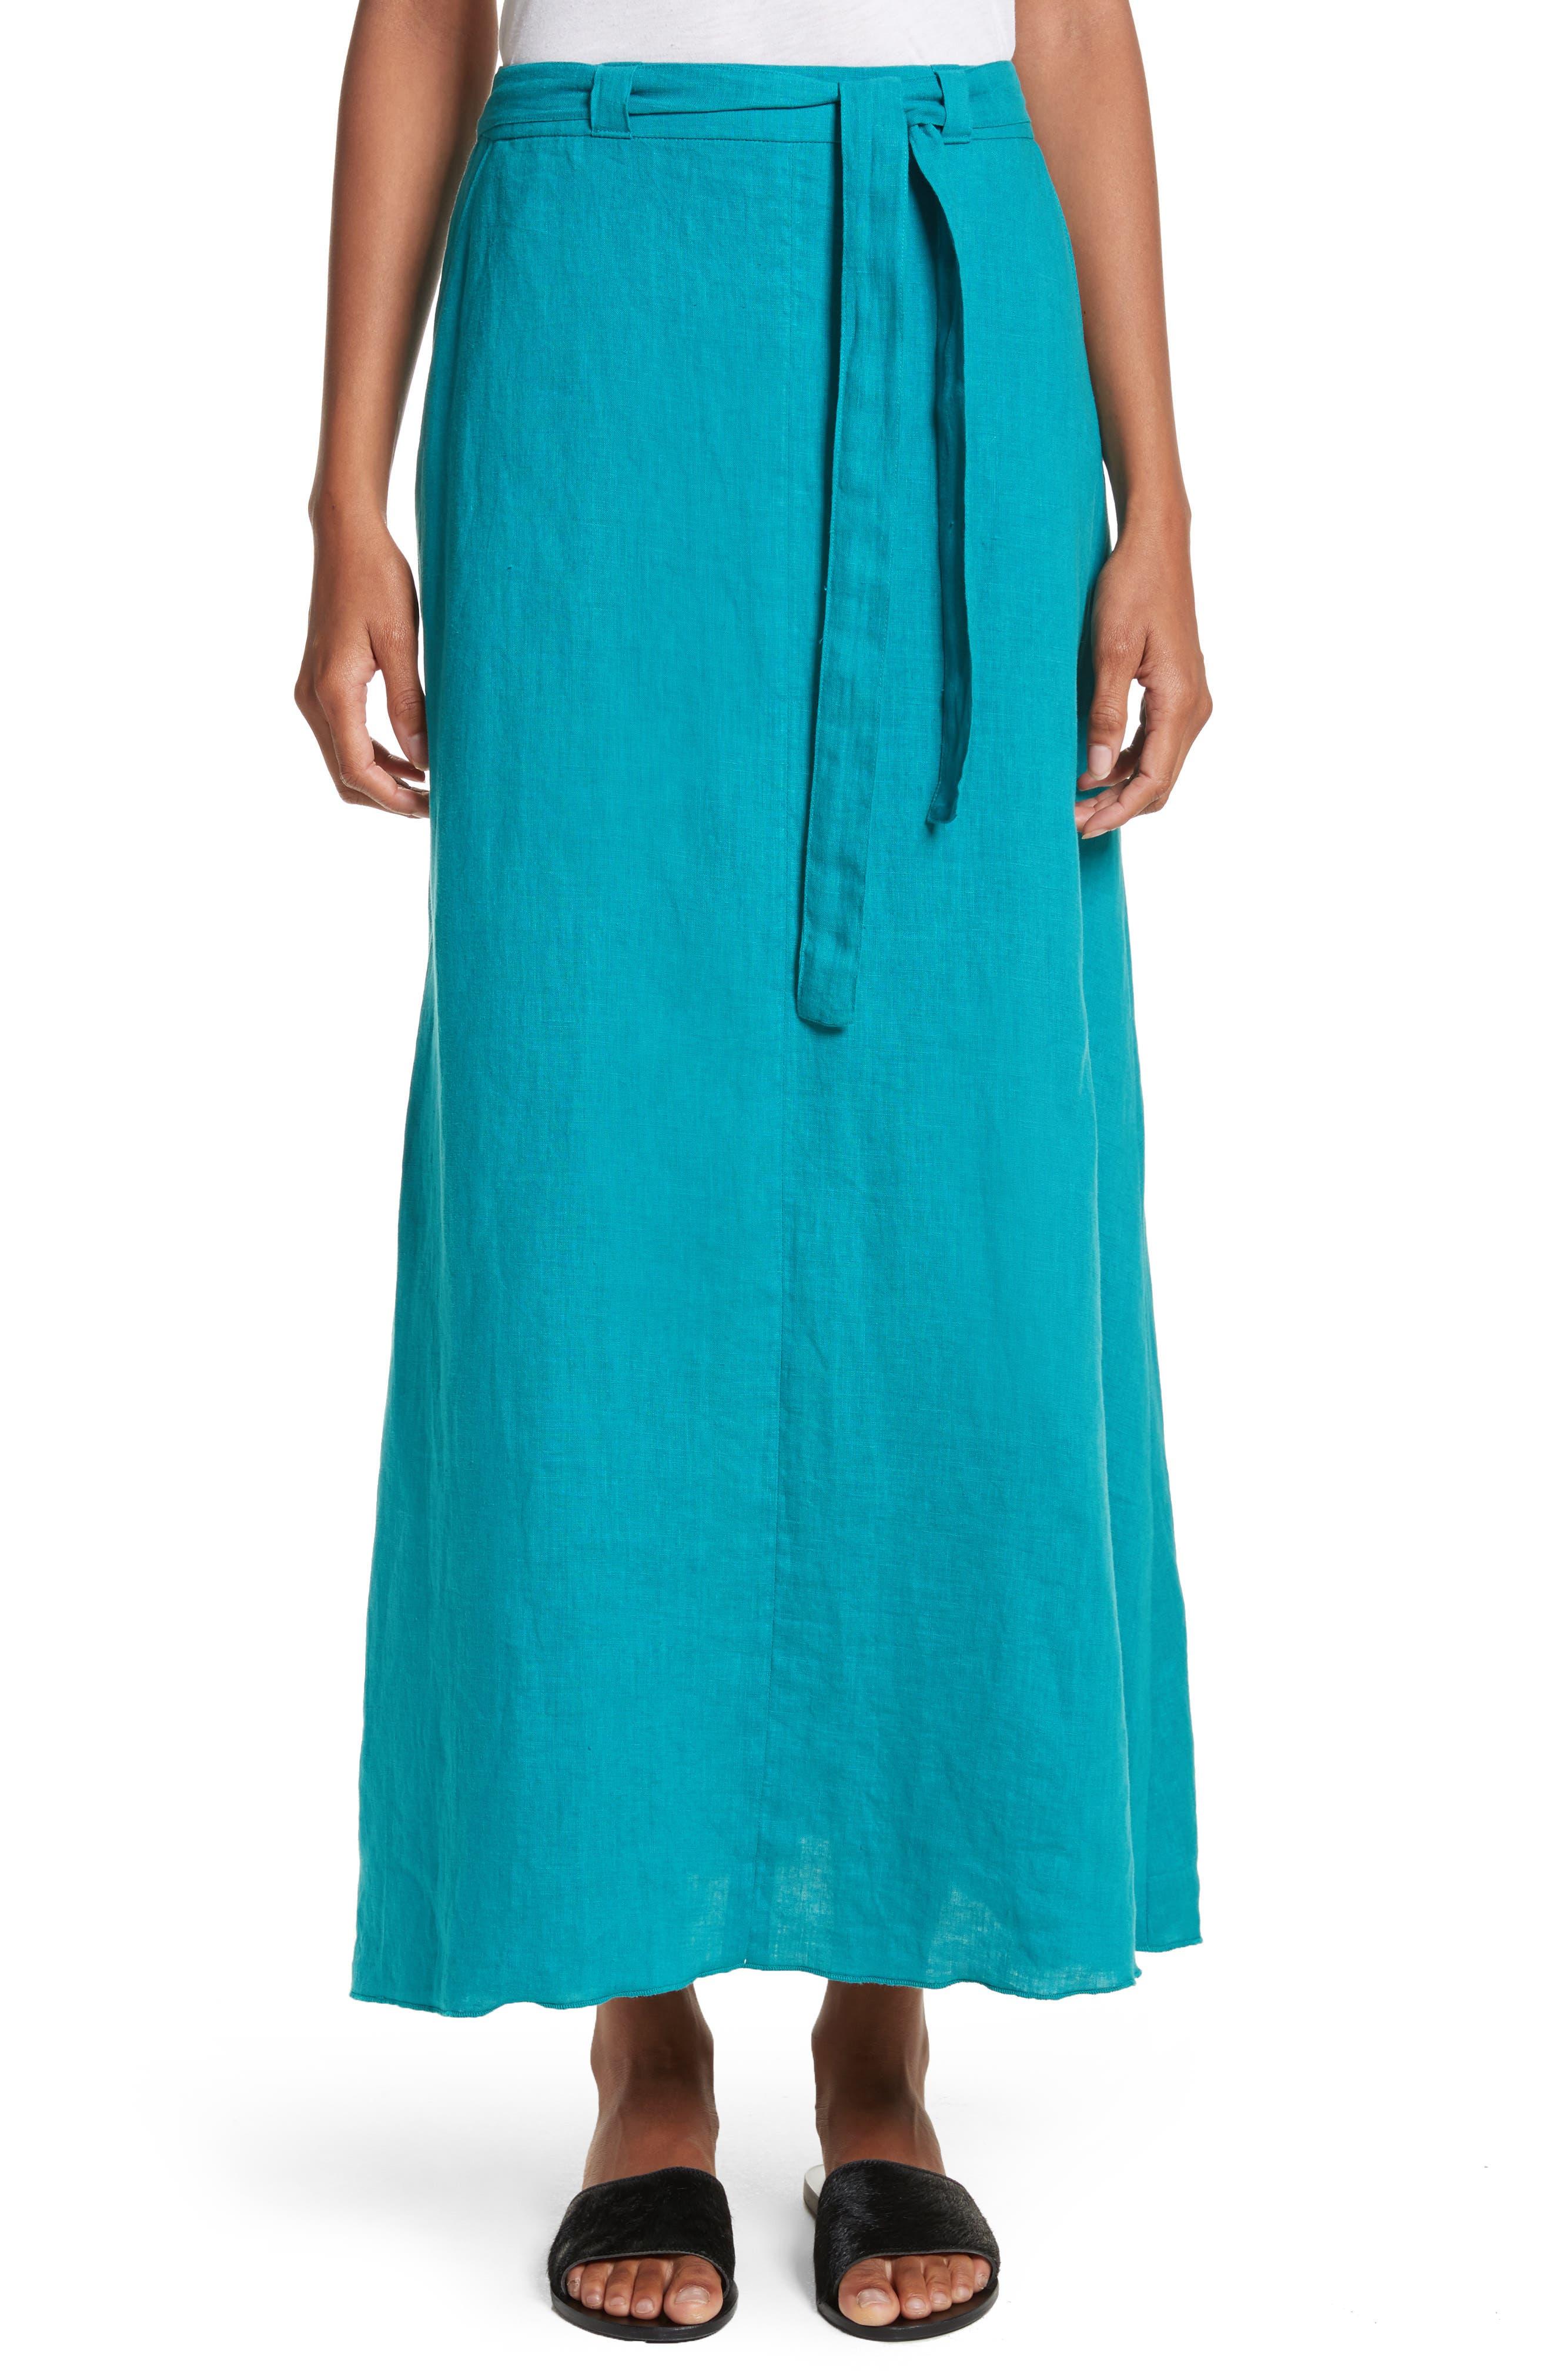 Simon Miller Delta Tie Waist Linen Skirt